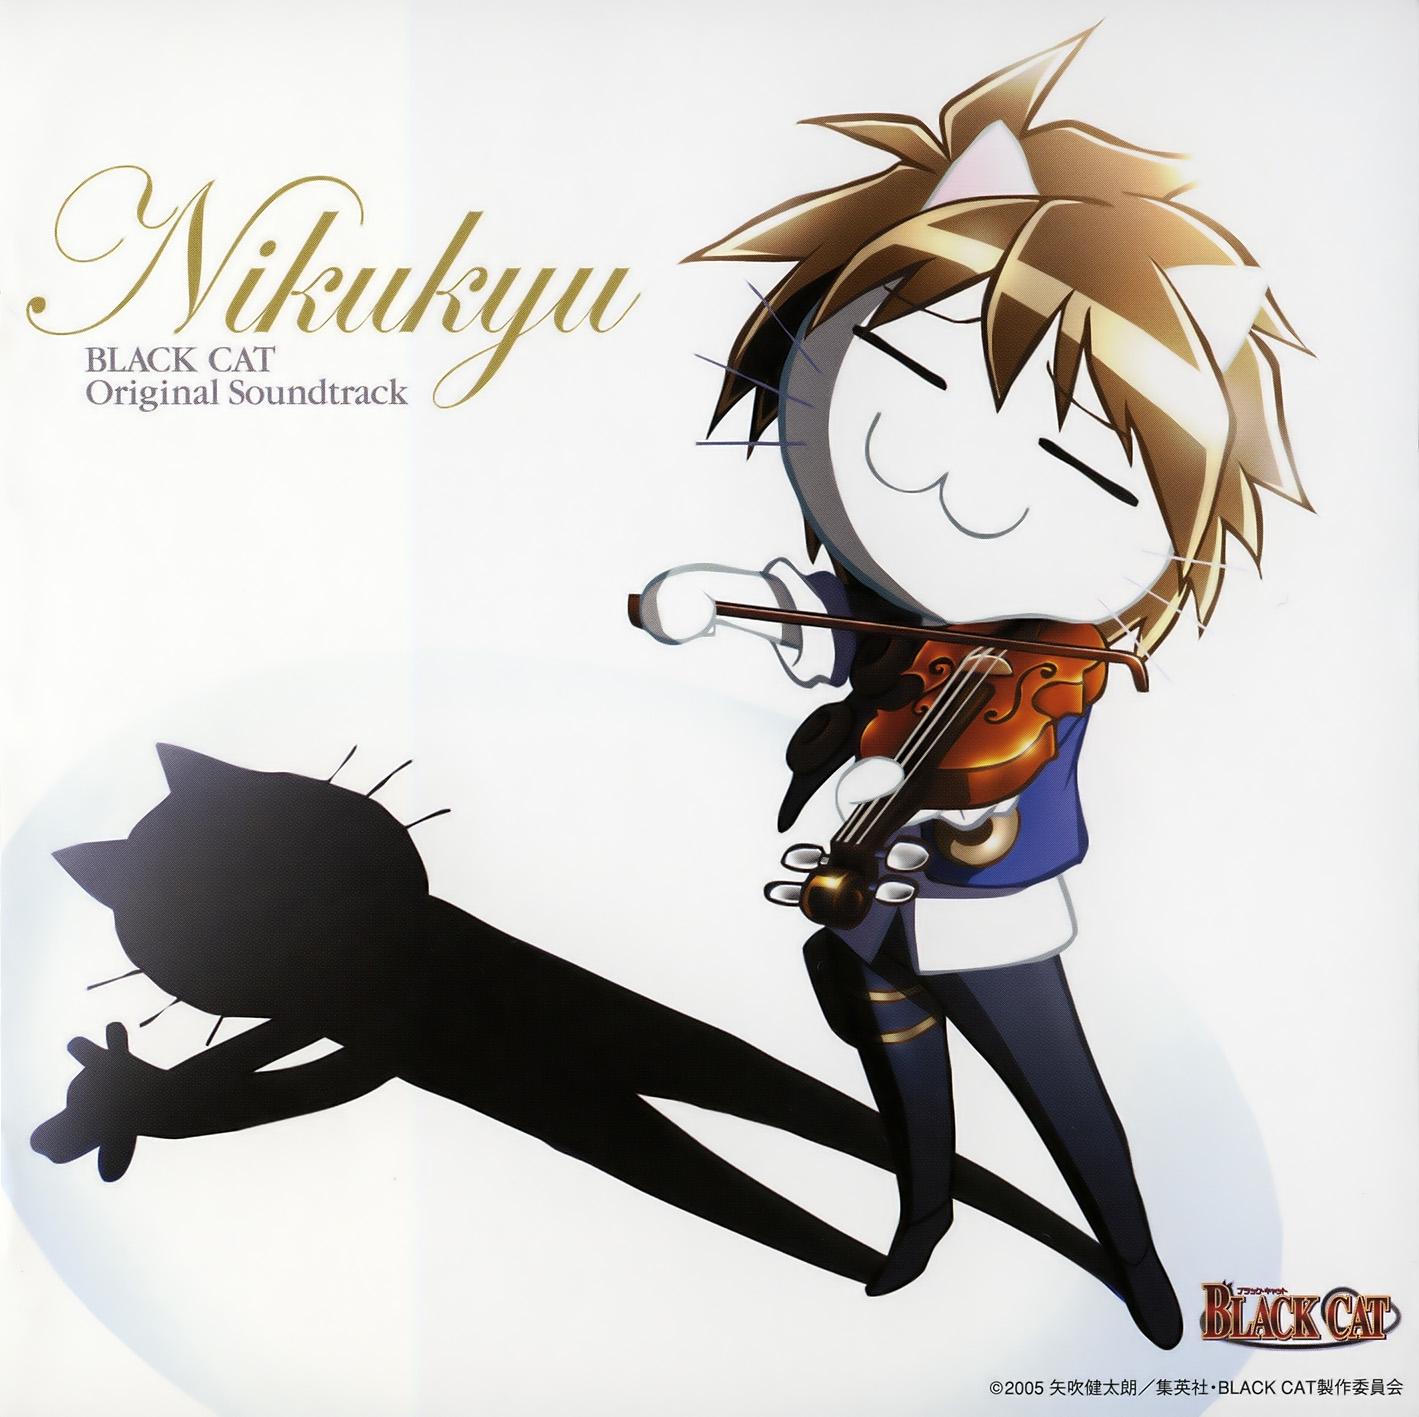 Black Cat Quot Nikukyu Quot Original Soundtrack Black Cat Wiki